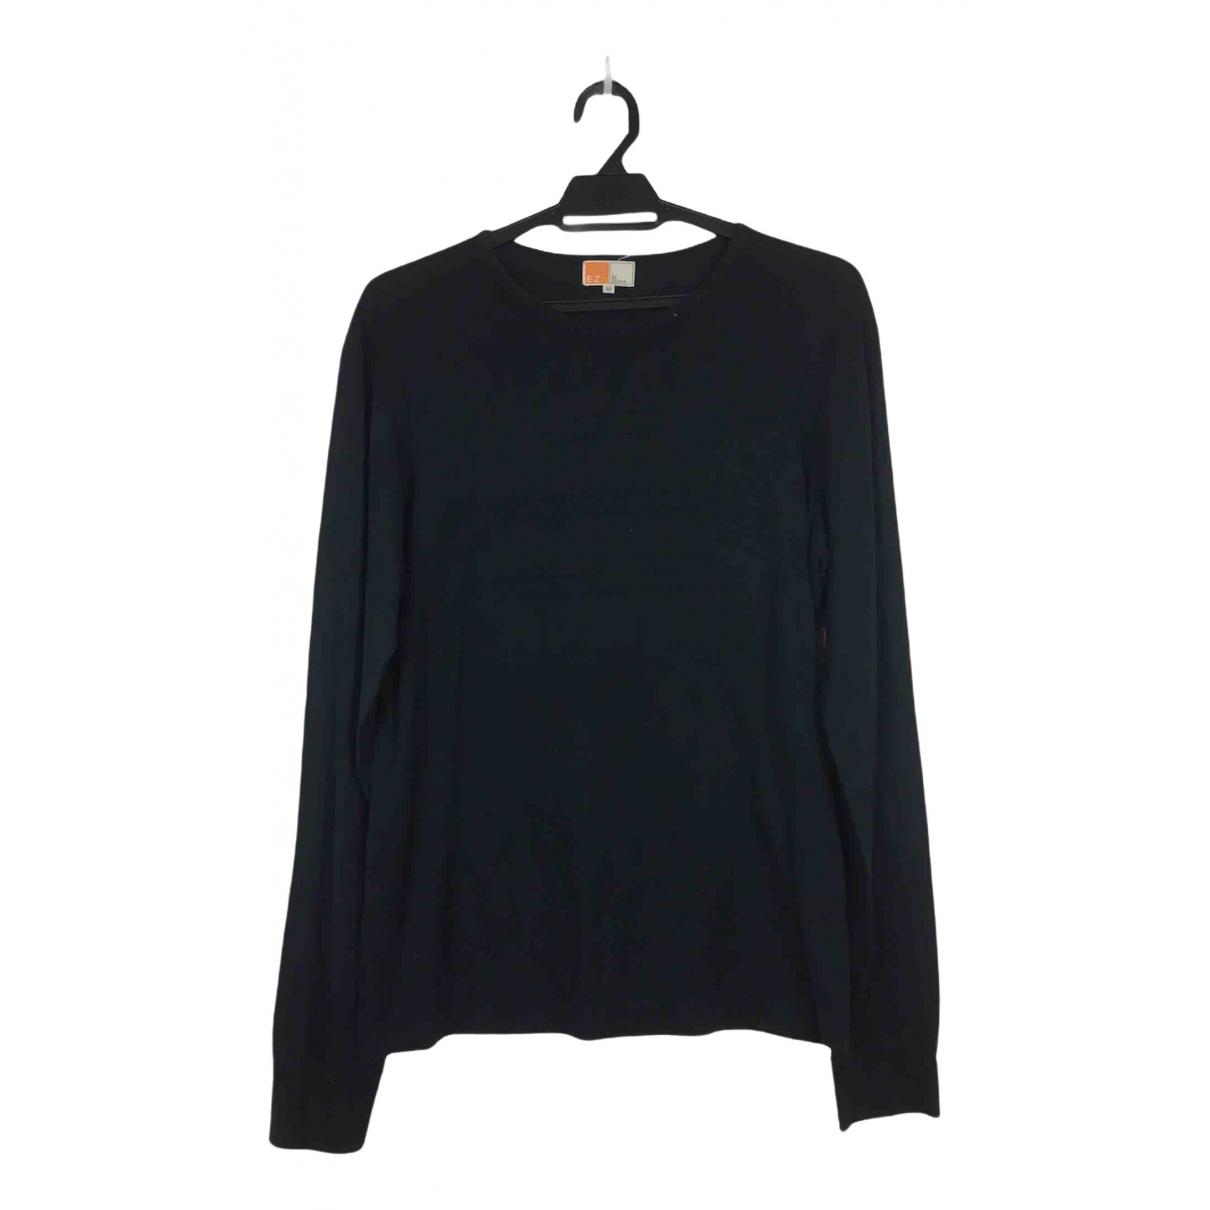 Ermenegildo Zegna \N Black Cotton  top for Women M International